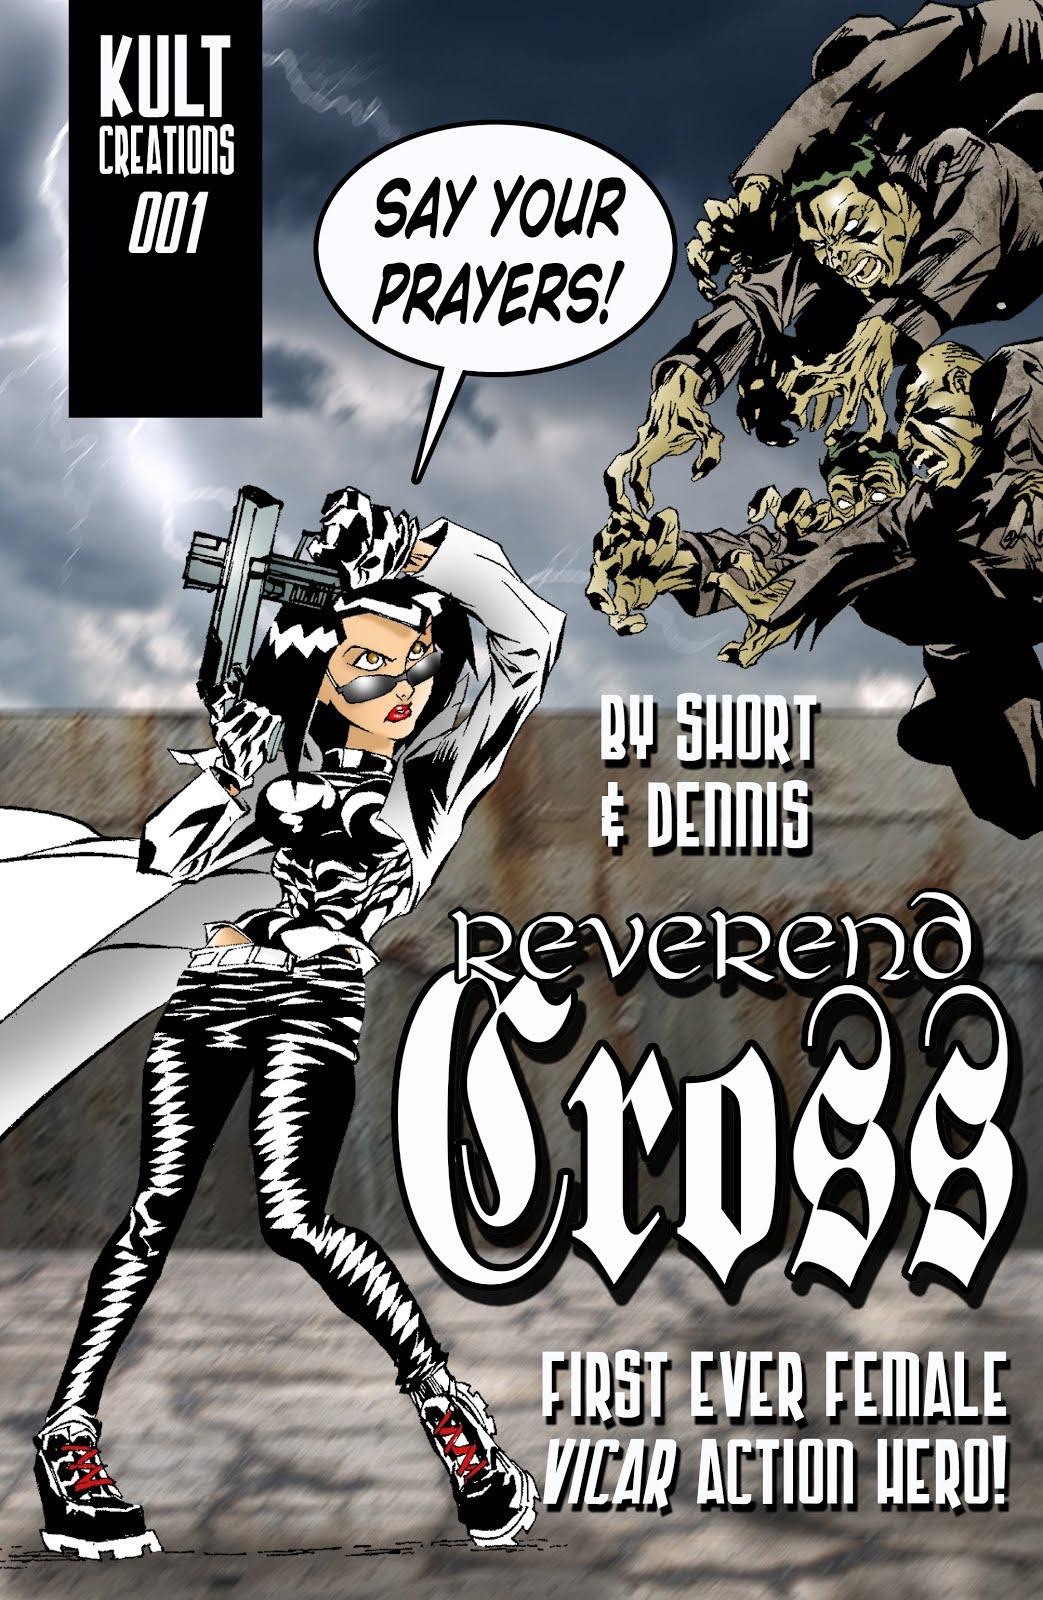 Buy REVEREND CROSS issue 001 BELOW!